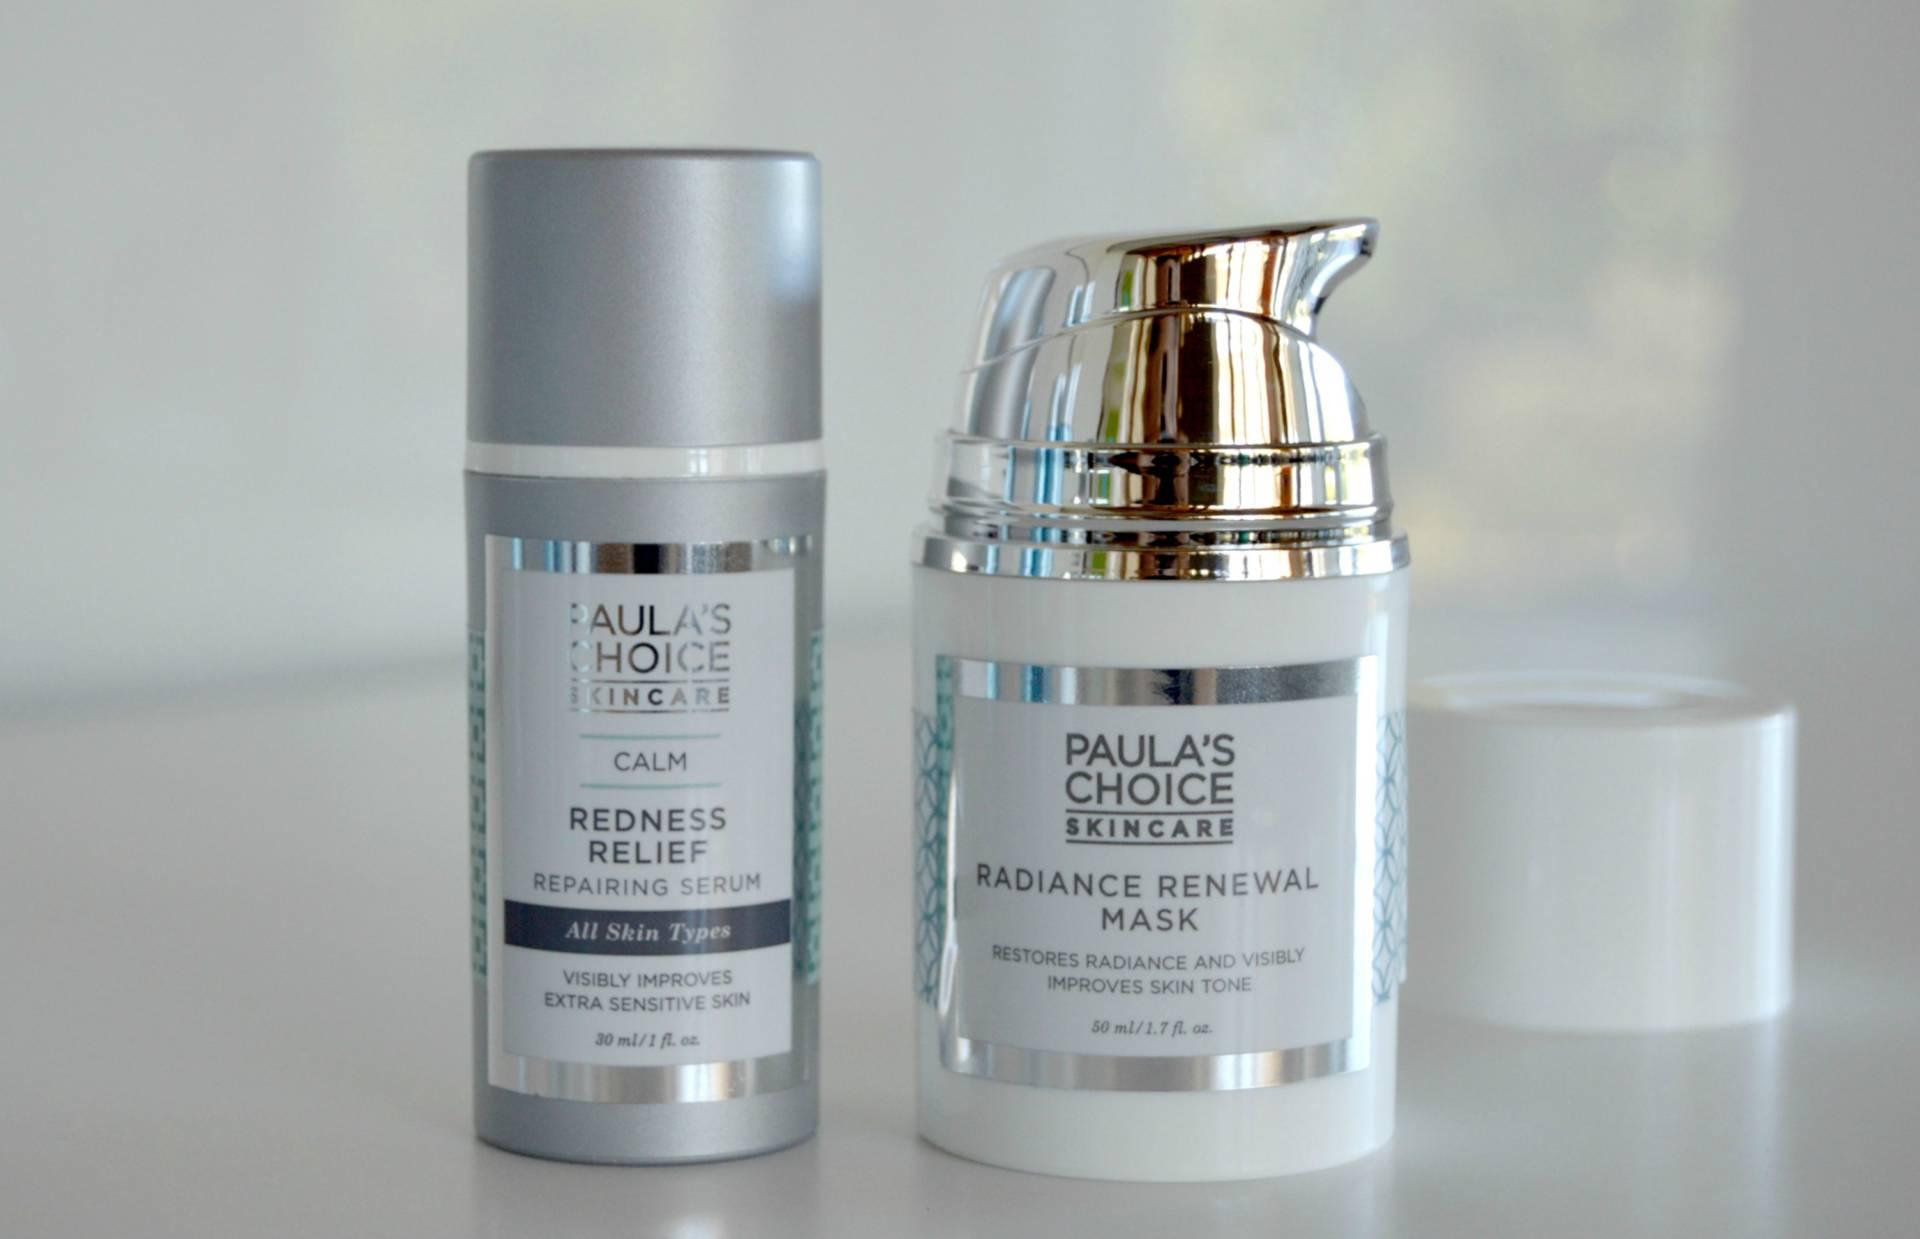 paulas choice new radiance renewal overnight mask review inhautepursuit